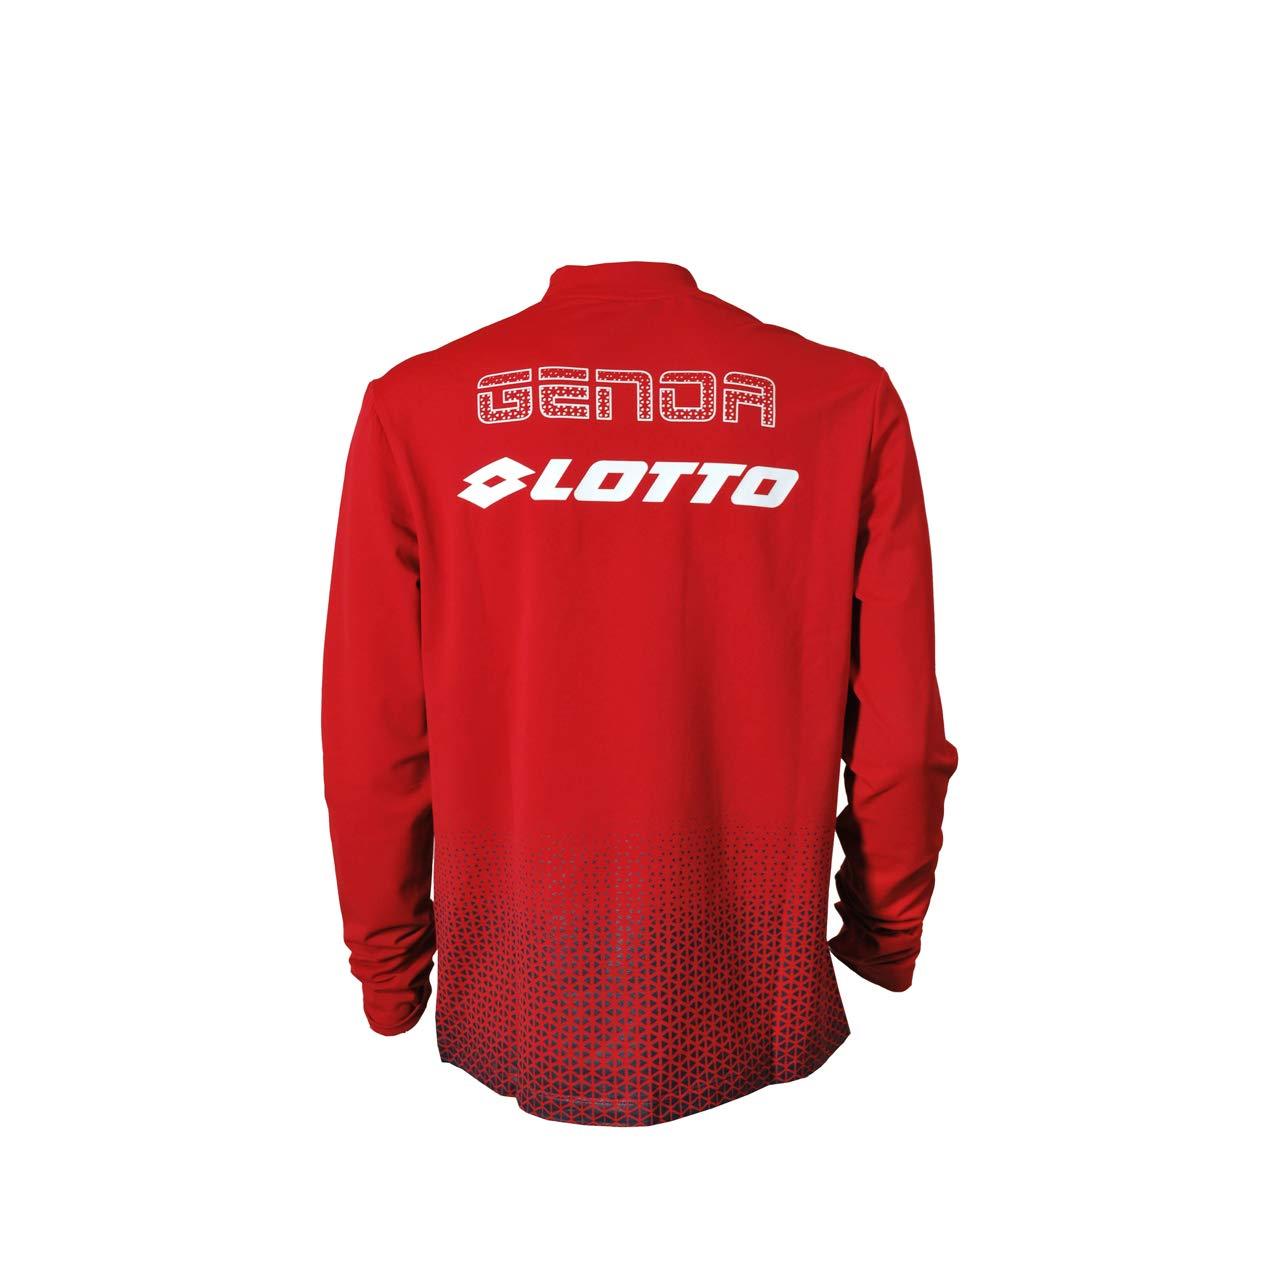 GENOA CRICKET AND FOOTBALL CLUB Felpa Allenamento Rossa